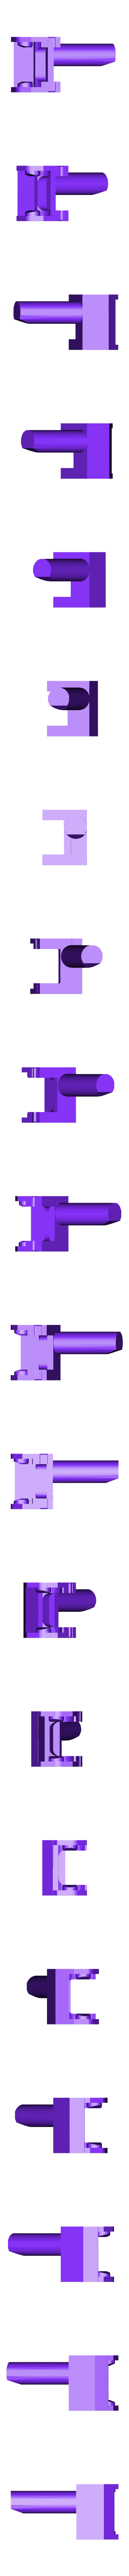 attache_chaine_hot_end_modele_discoultimate.stl Download free STL file Chaine_Hot_End_(Modele_DiscoUltimate) • 3D printer object, juliencasimir83